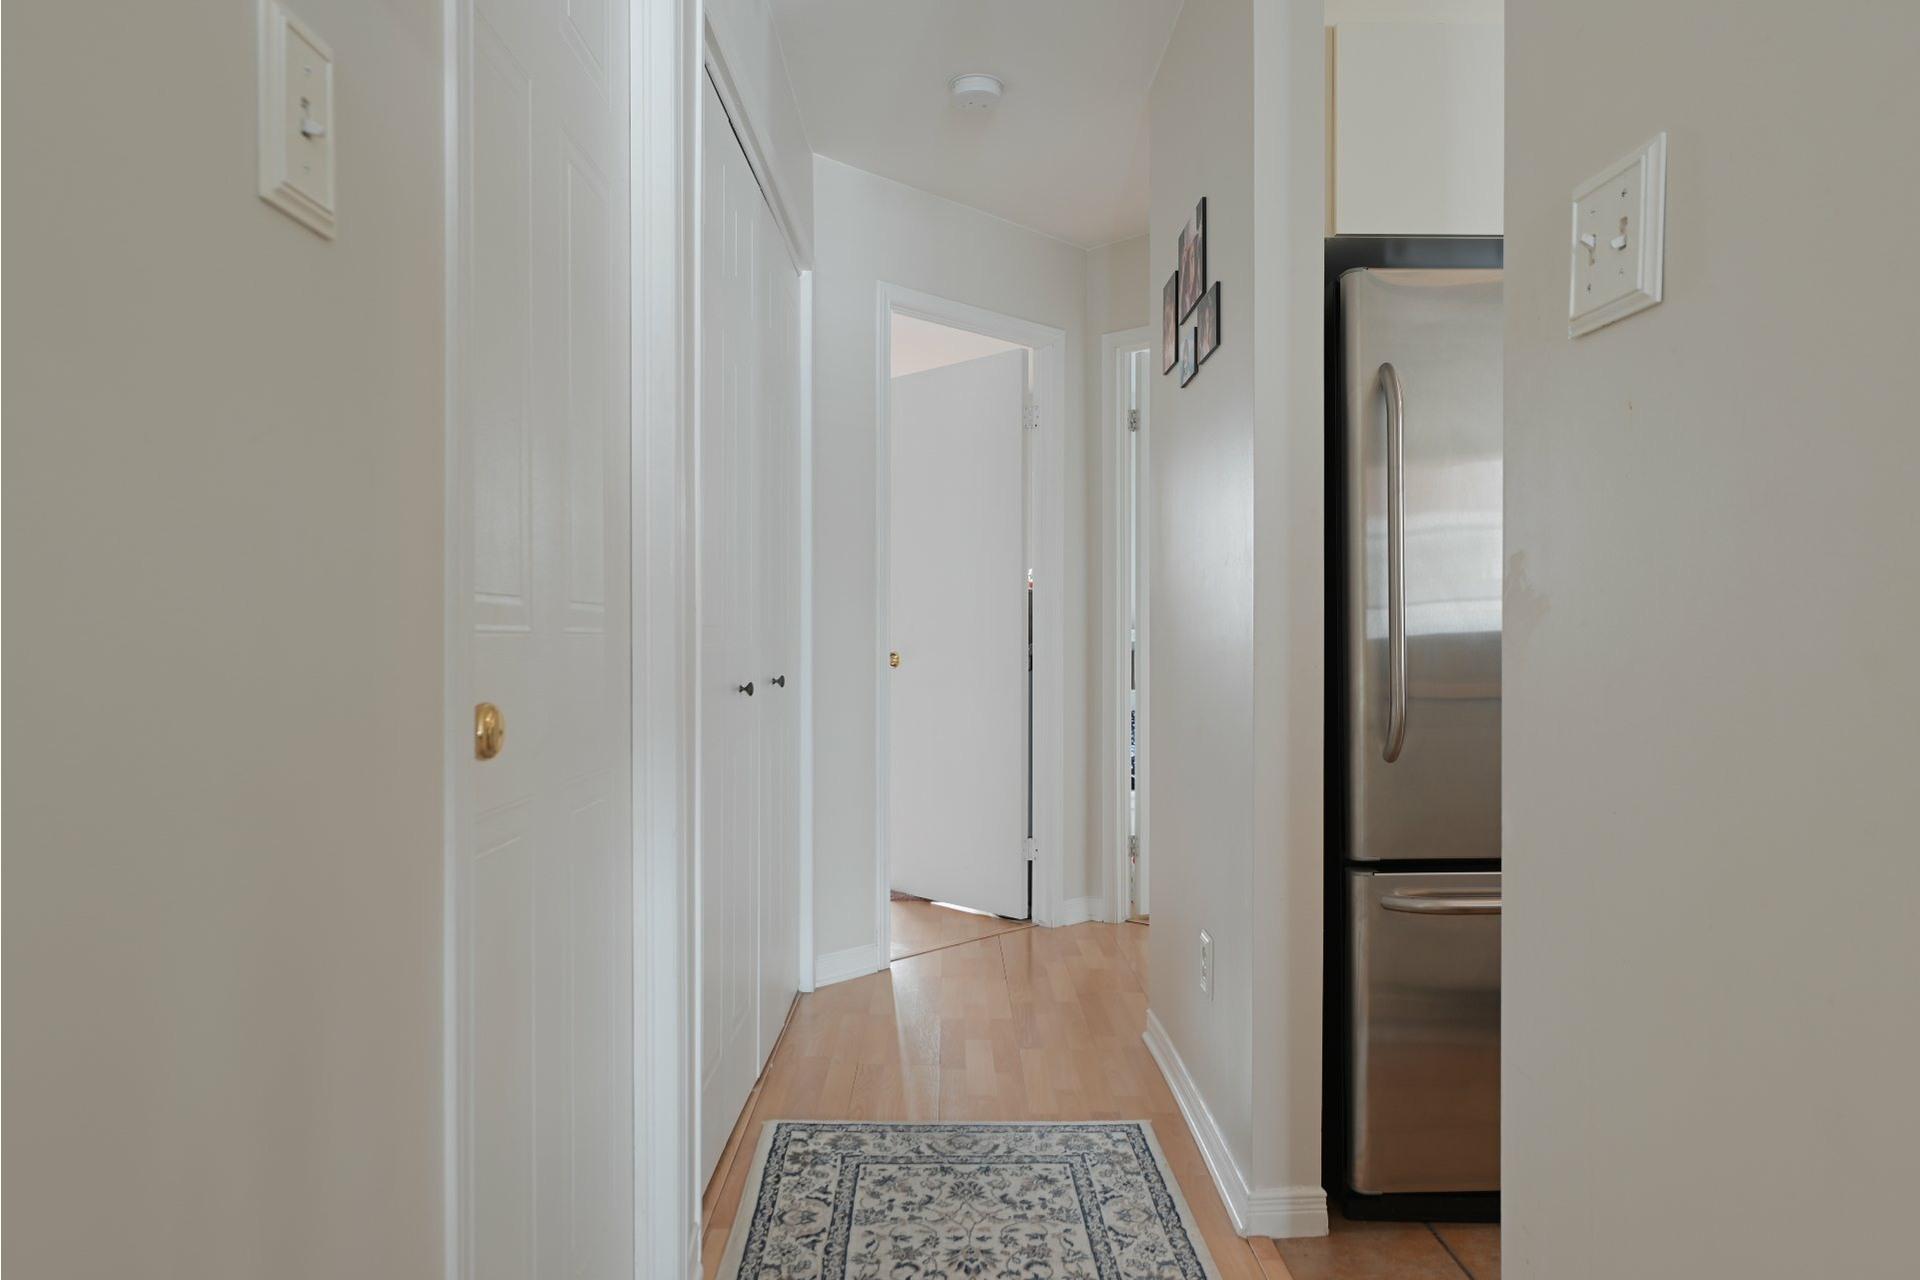 image 6 - 公寓 出租 La Prairie - 3 室